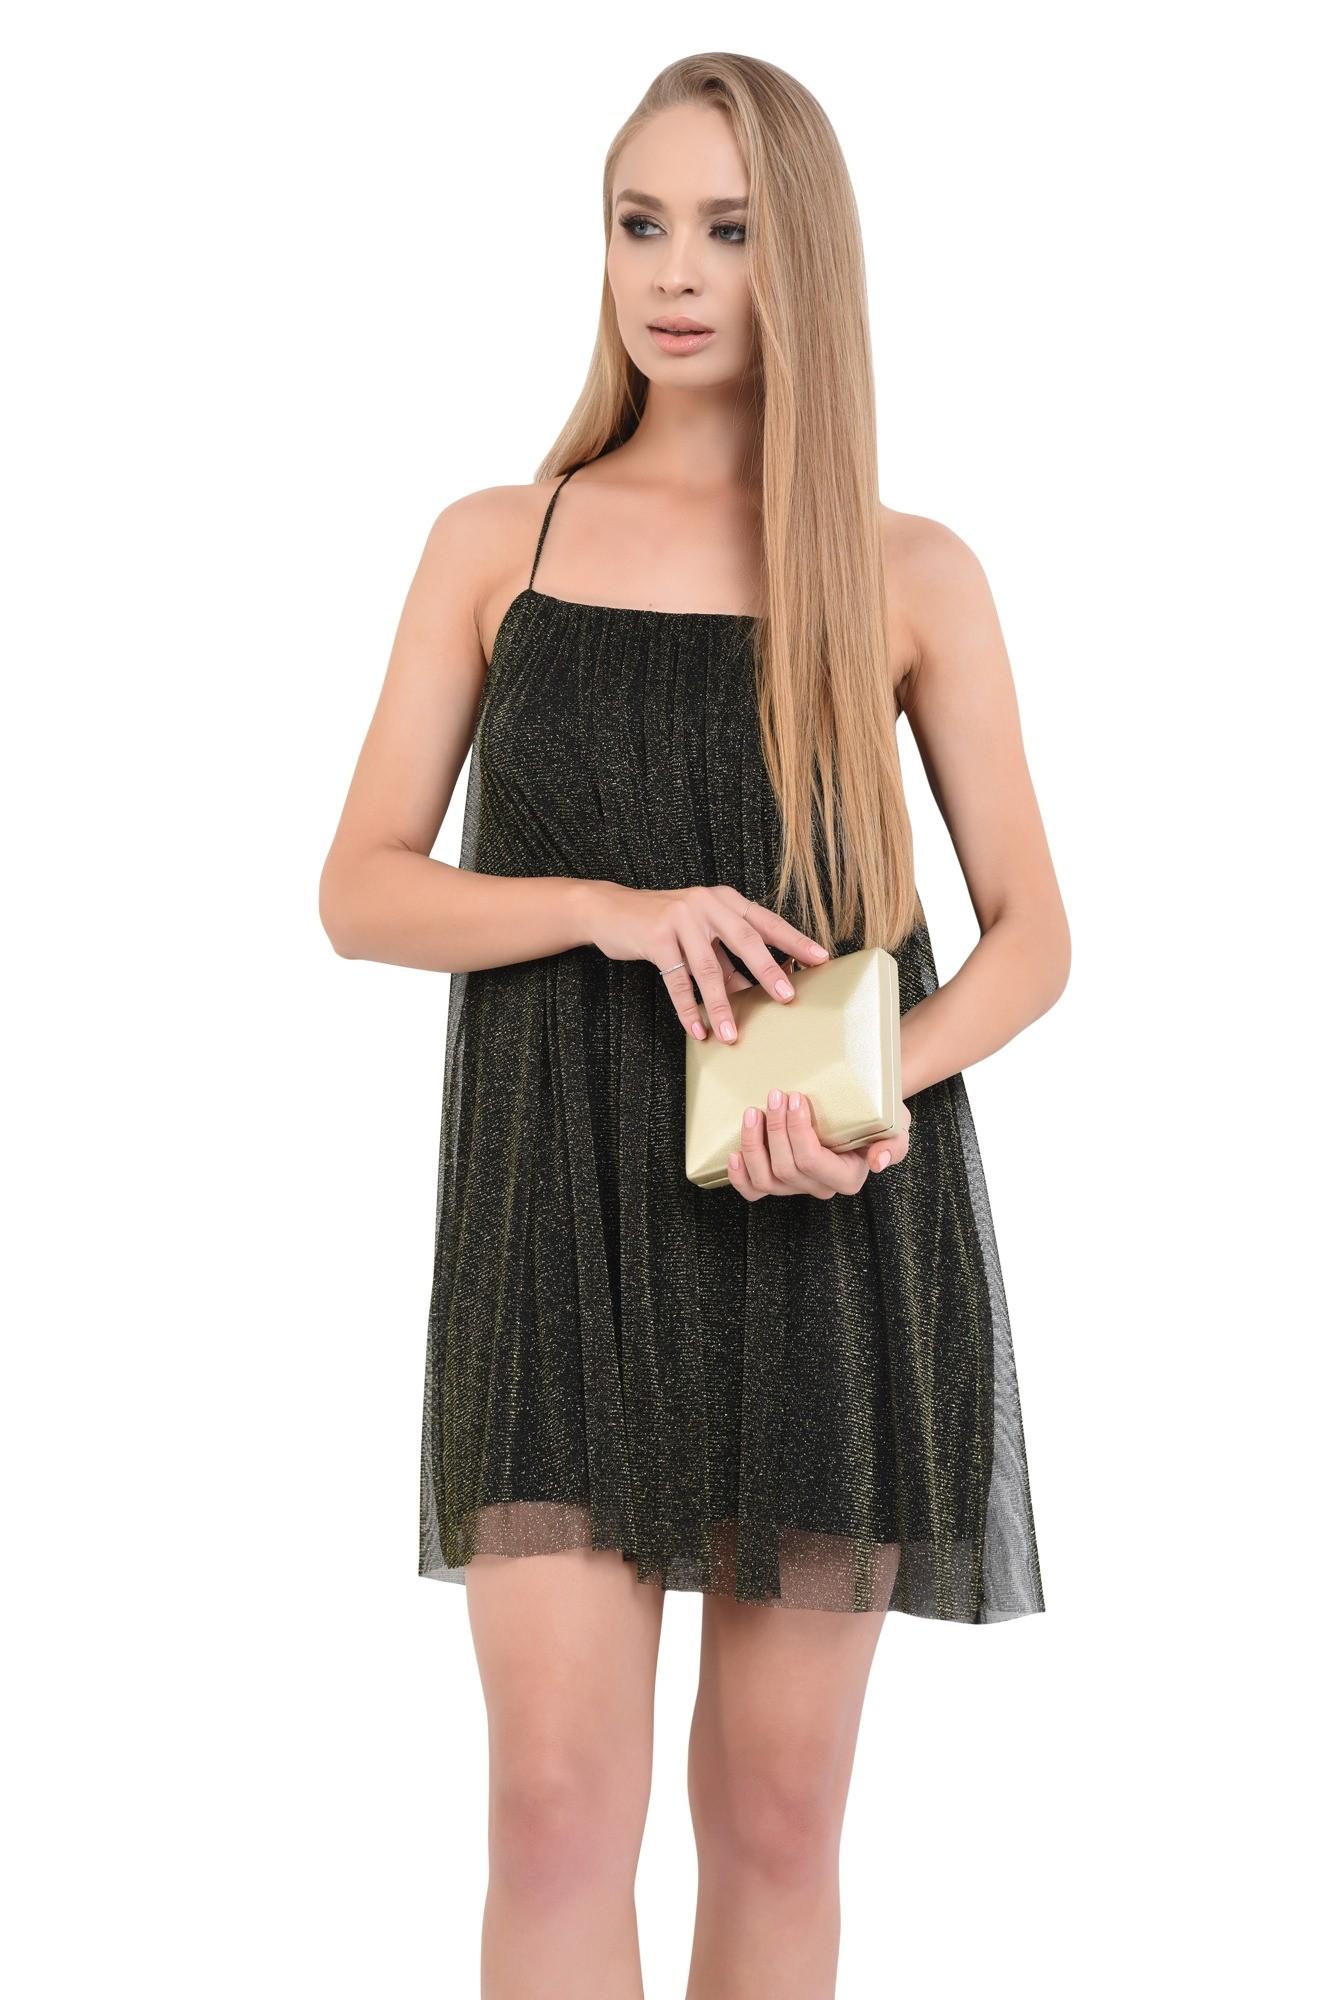 rochie eleganta, negru, bretele subtiri, mini